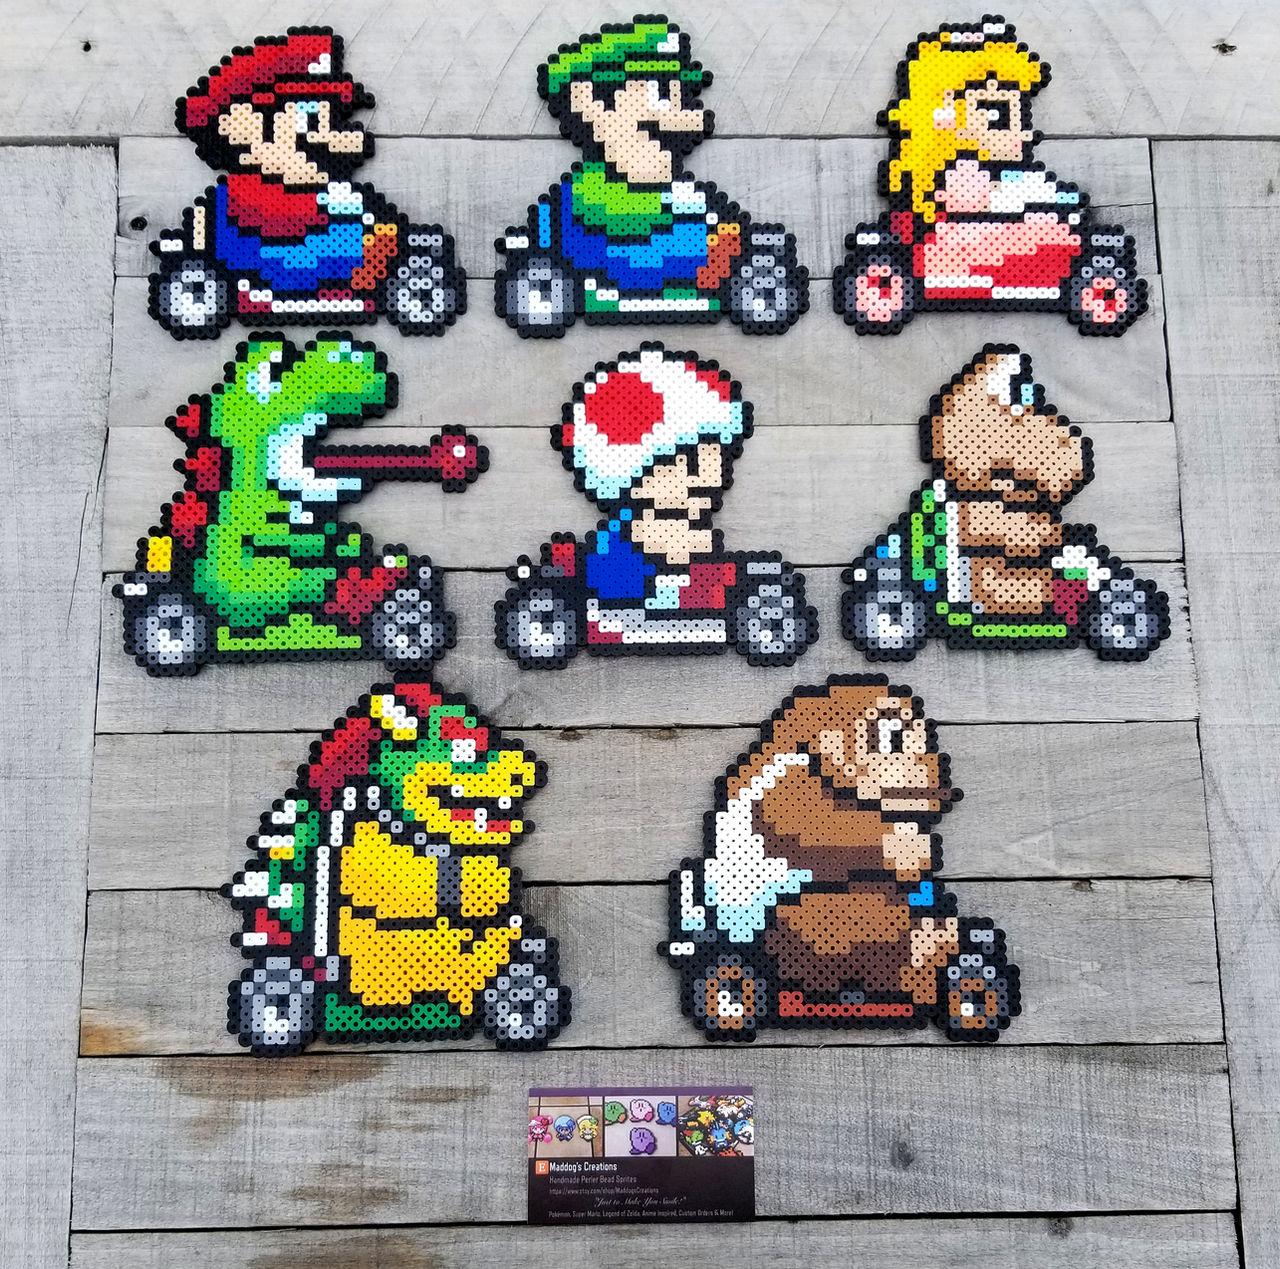 Mario Kart Video Game Perler Bead Sprites By Maddogscreations On Deviantart